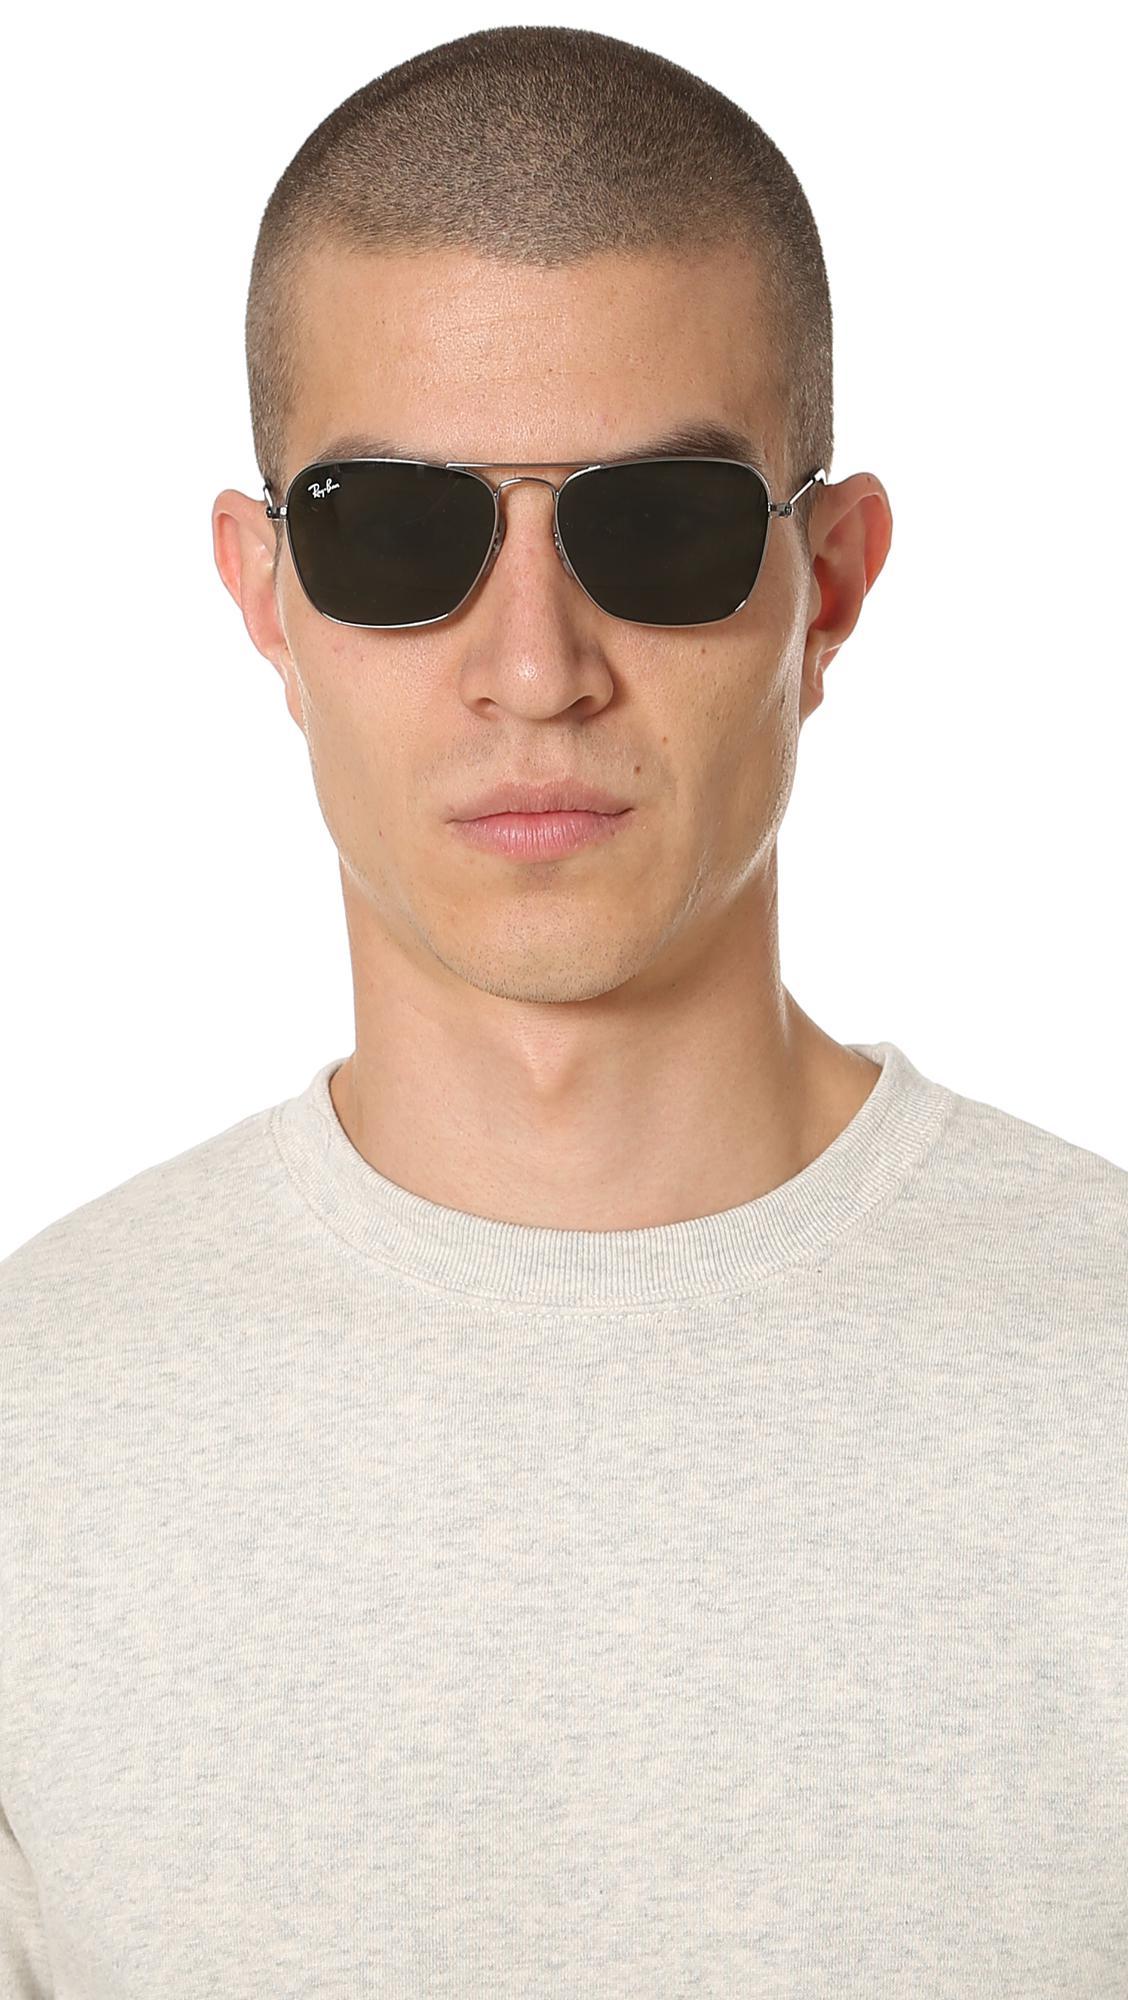 edfcfccb59a Ray-Ban - Metallic Caravan Sunglasses for Men - Lyst. View fullscreen